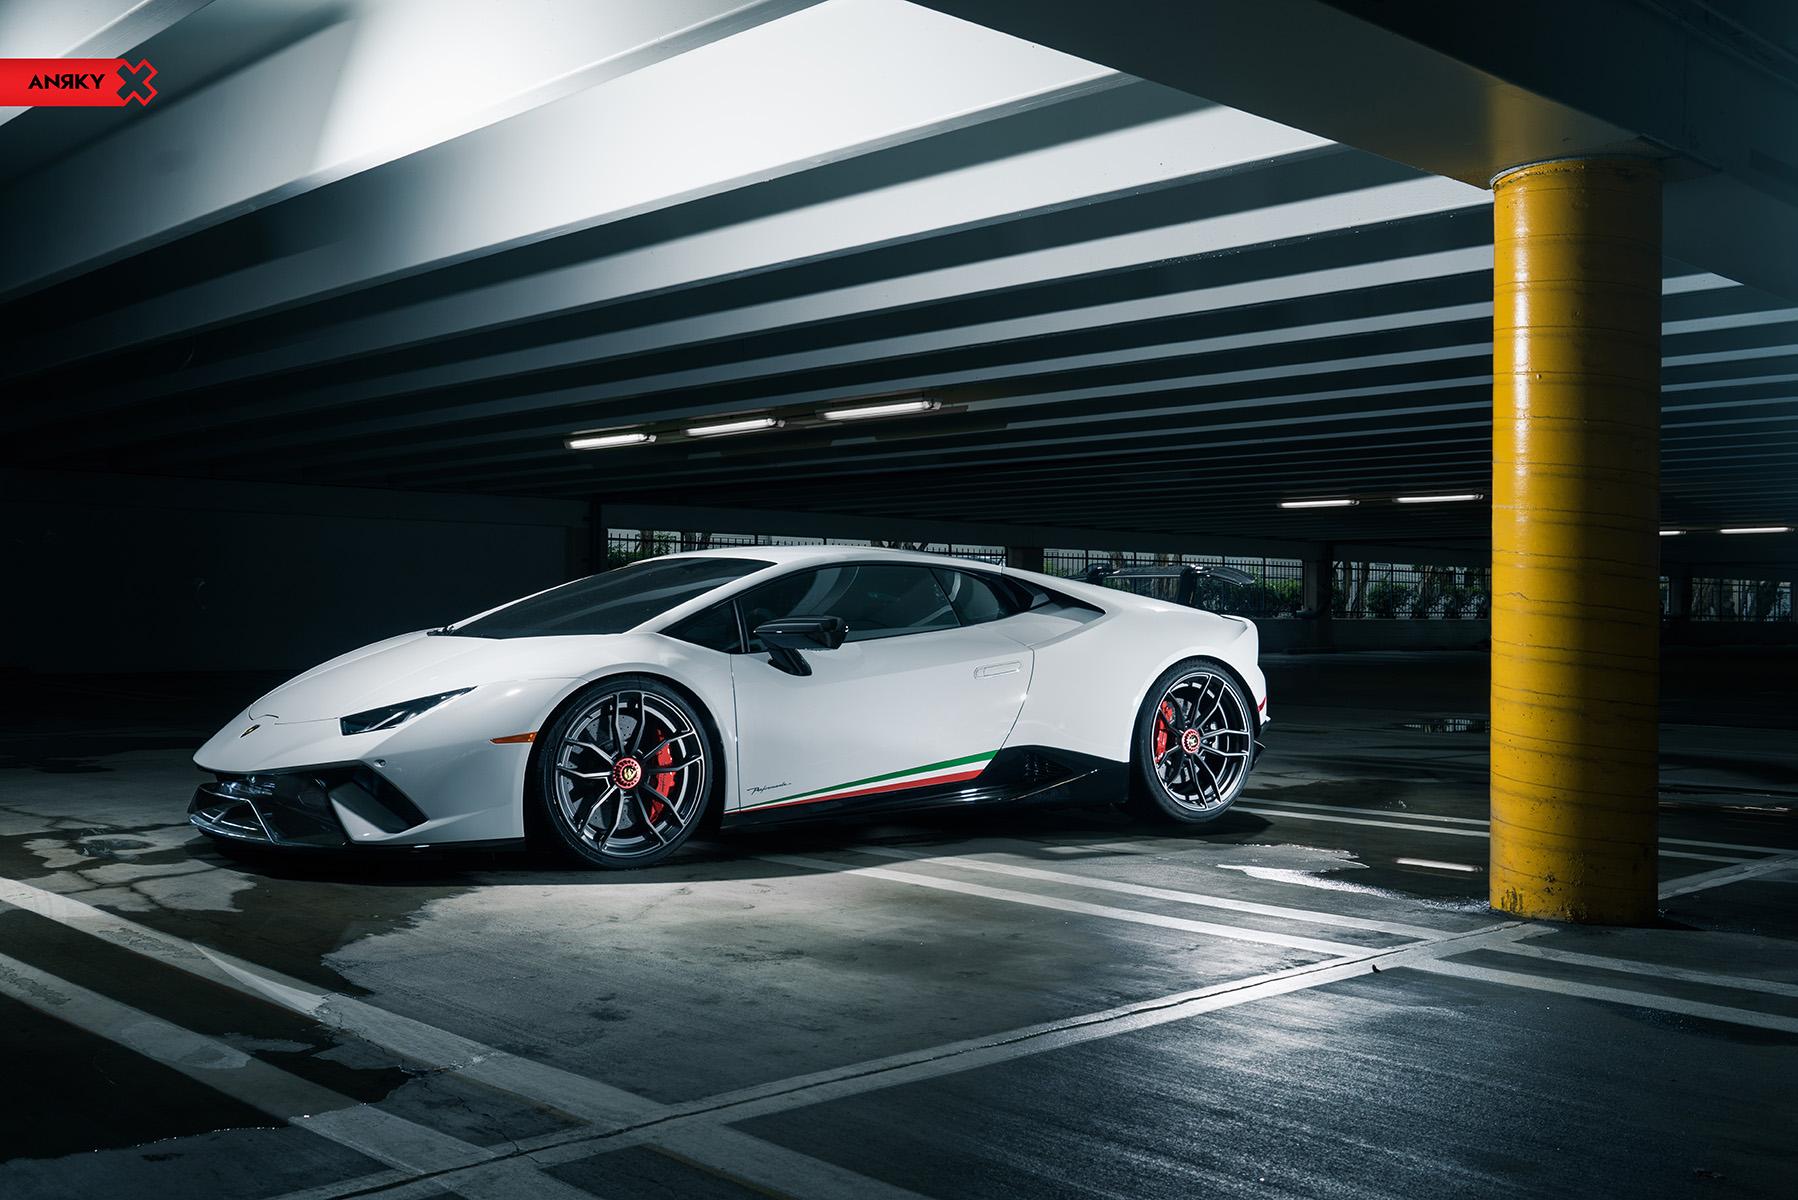 Lamborghini Huracan Performante Anrky Wheels